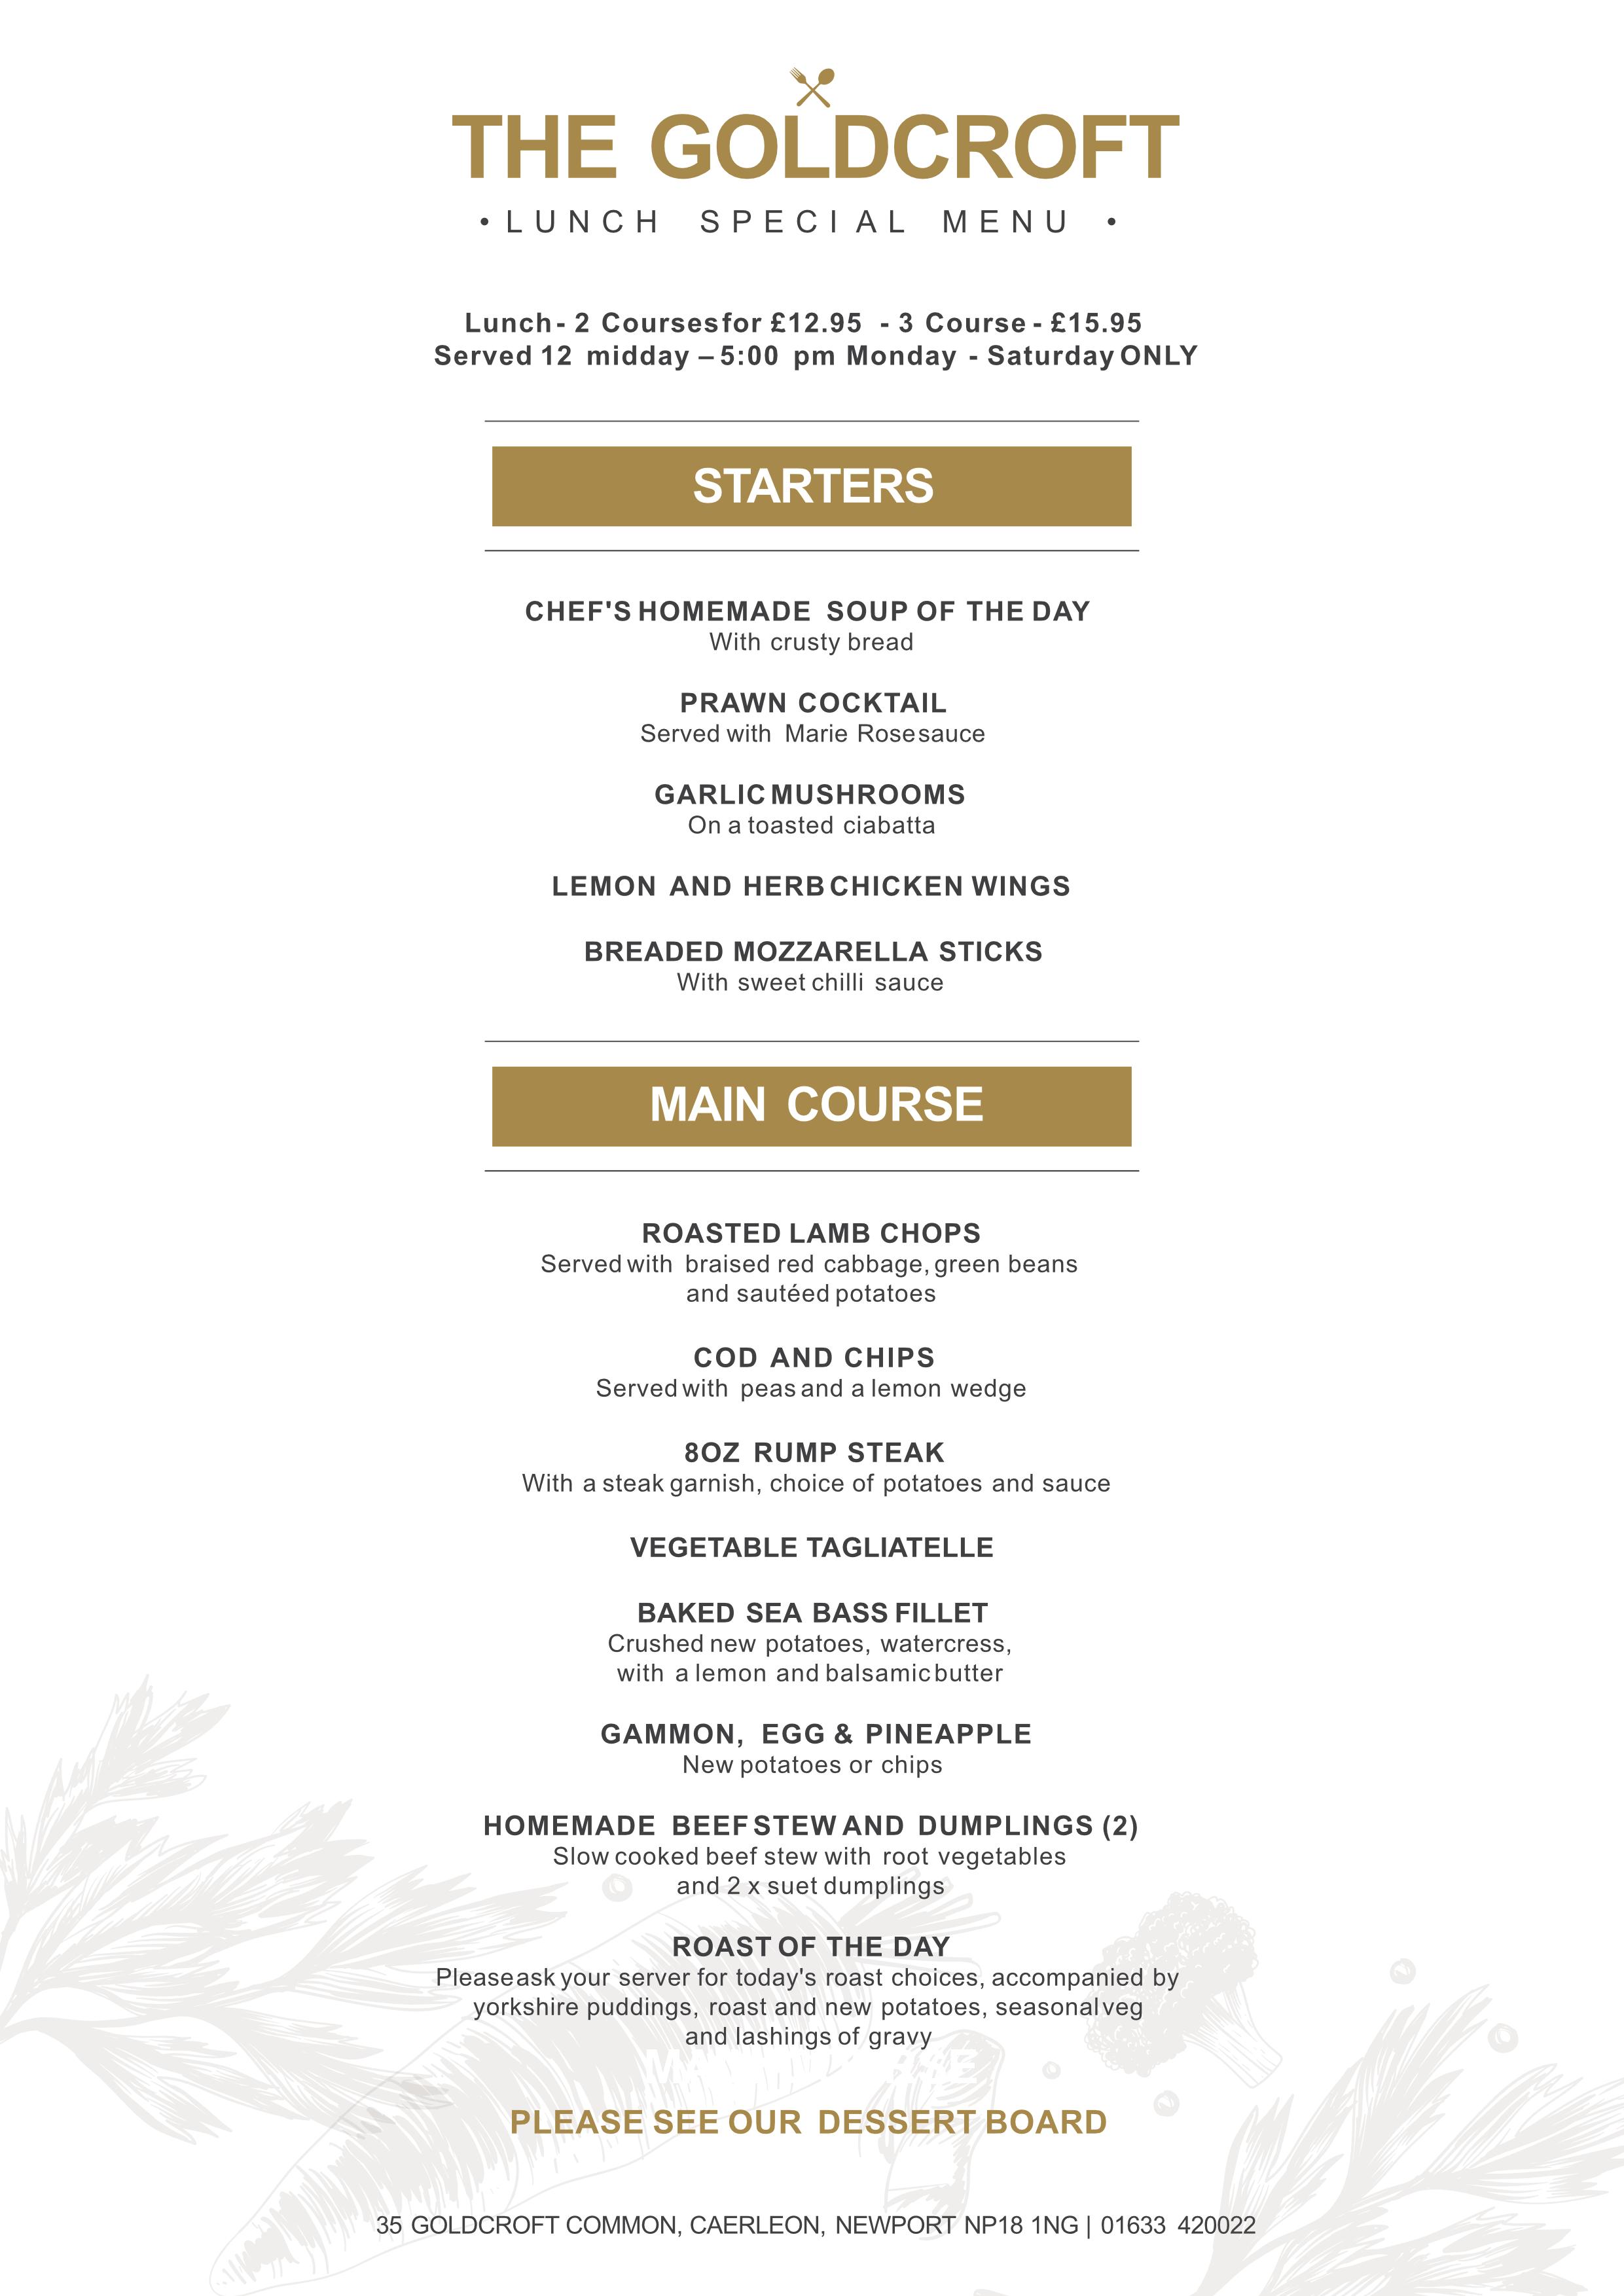 Goldcroft A5 Lunch Special Menu (1)